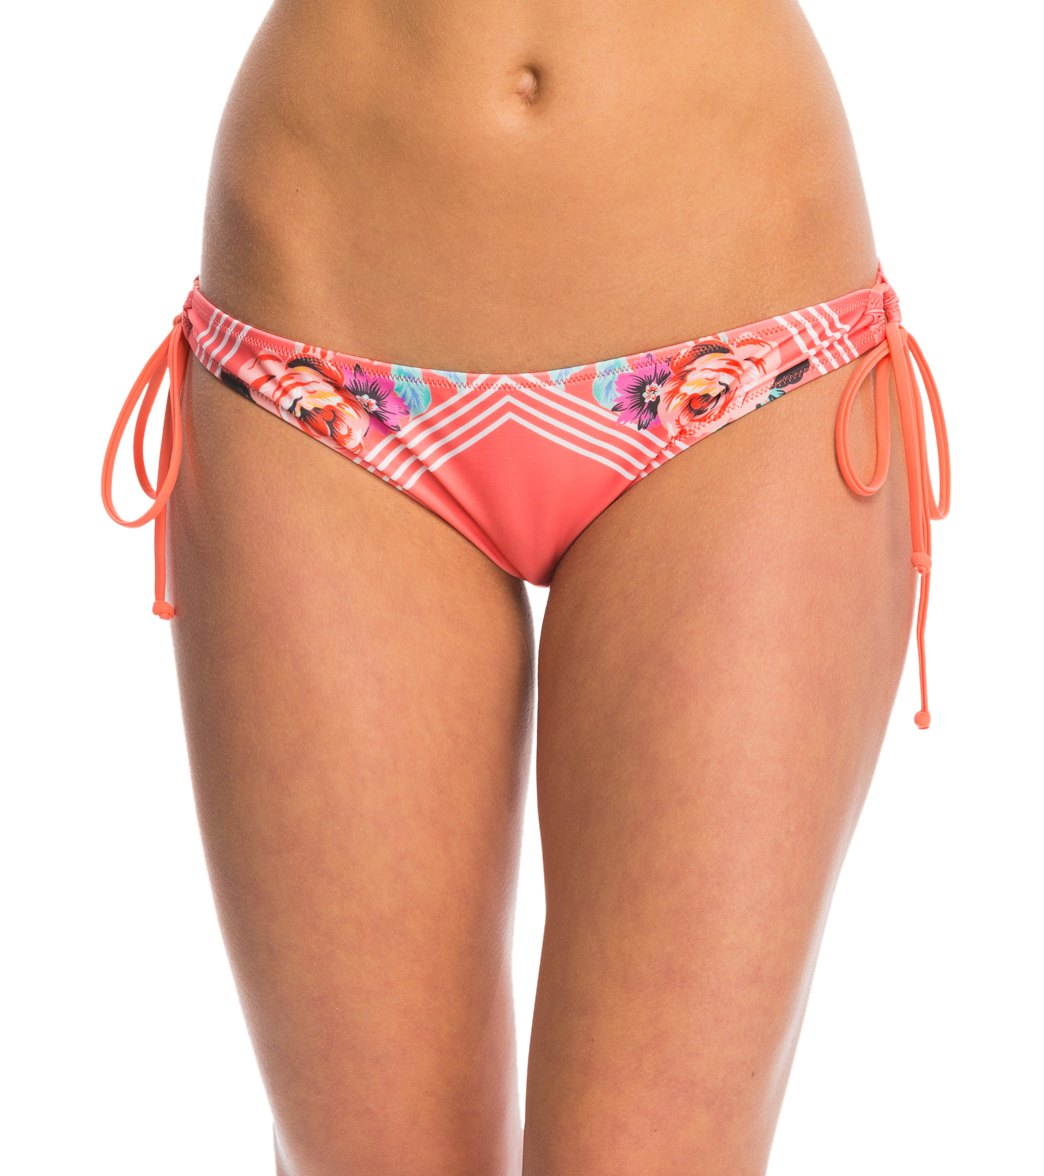 Beach bikini bottom pics 219